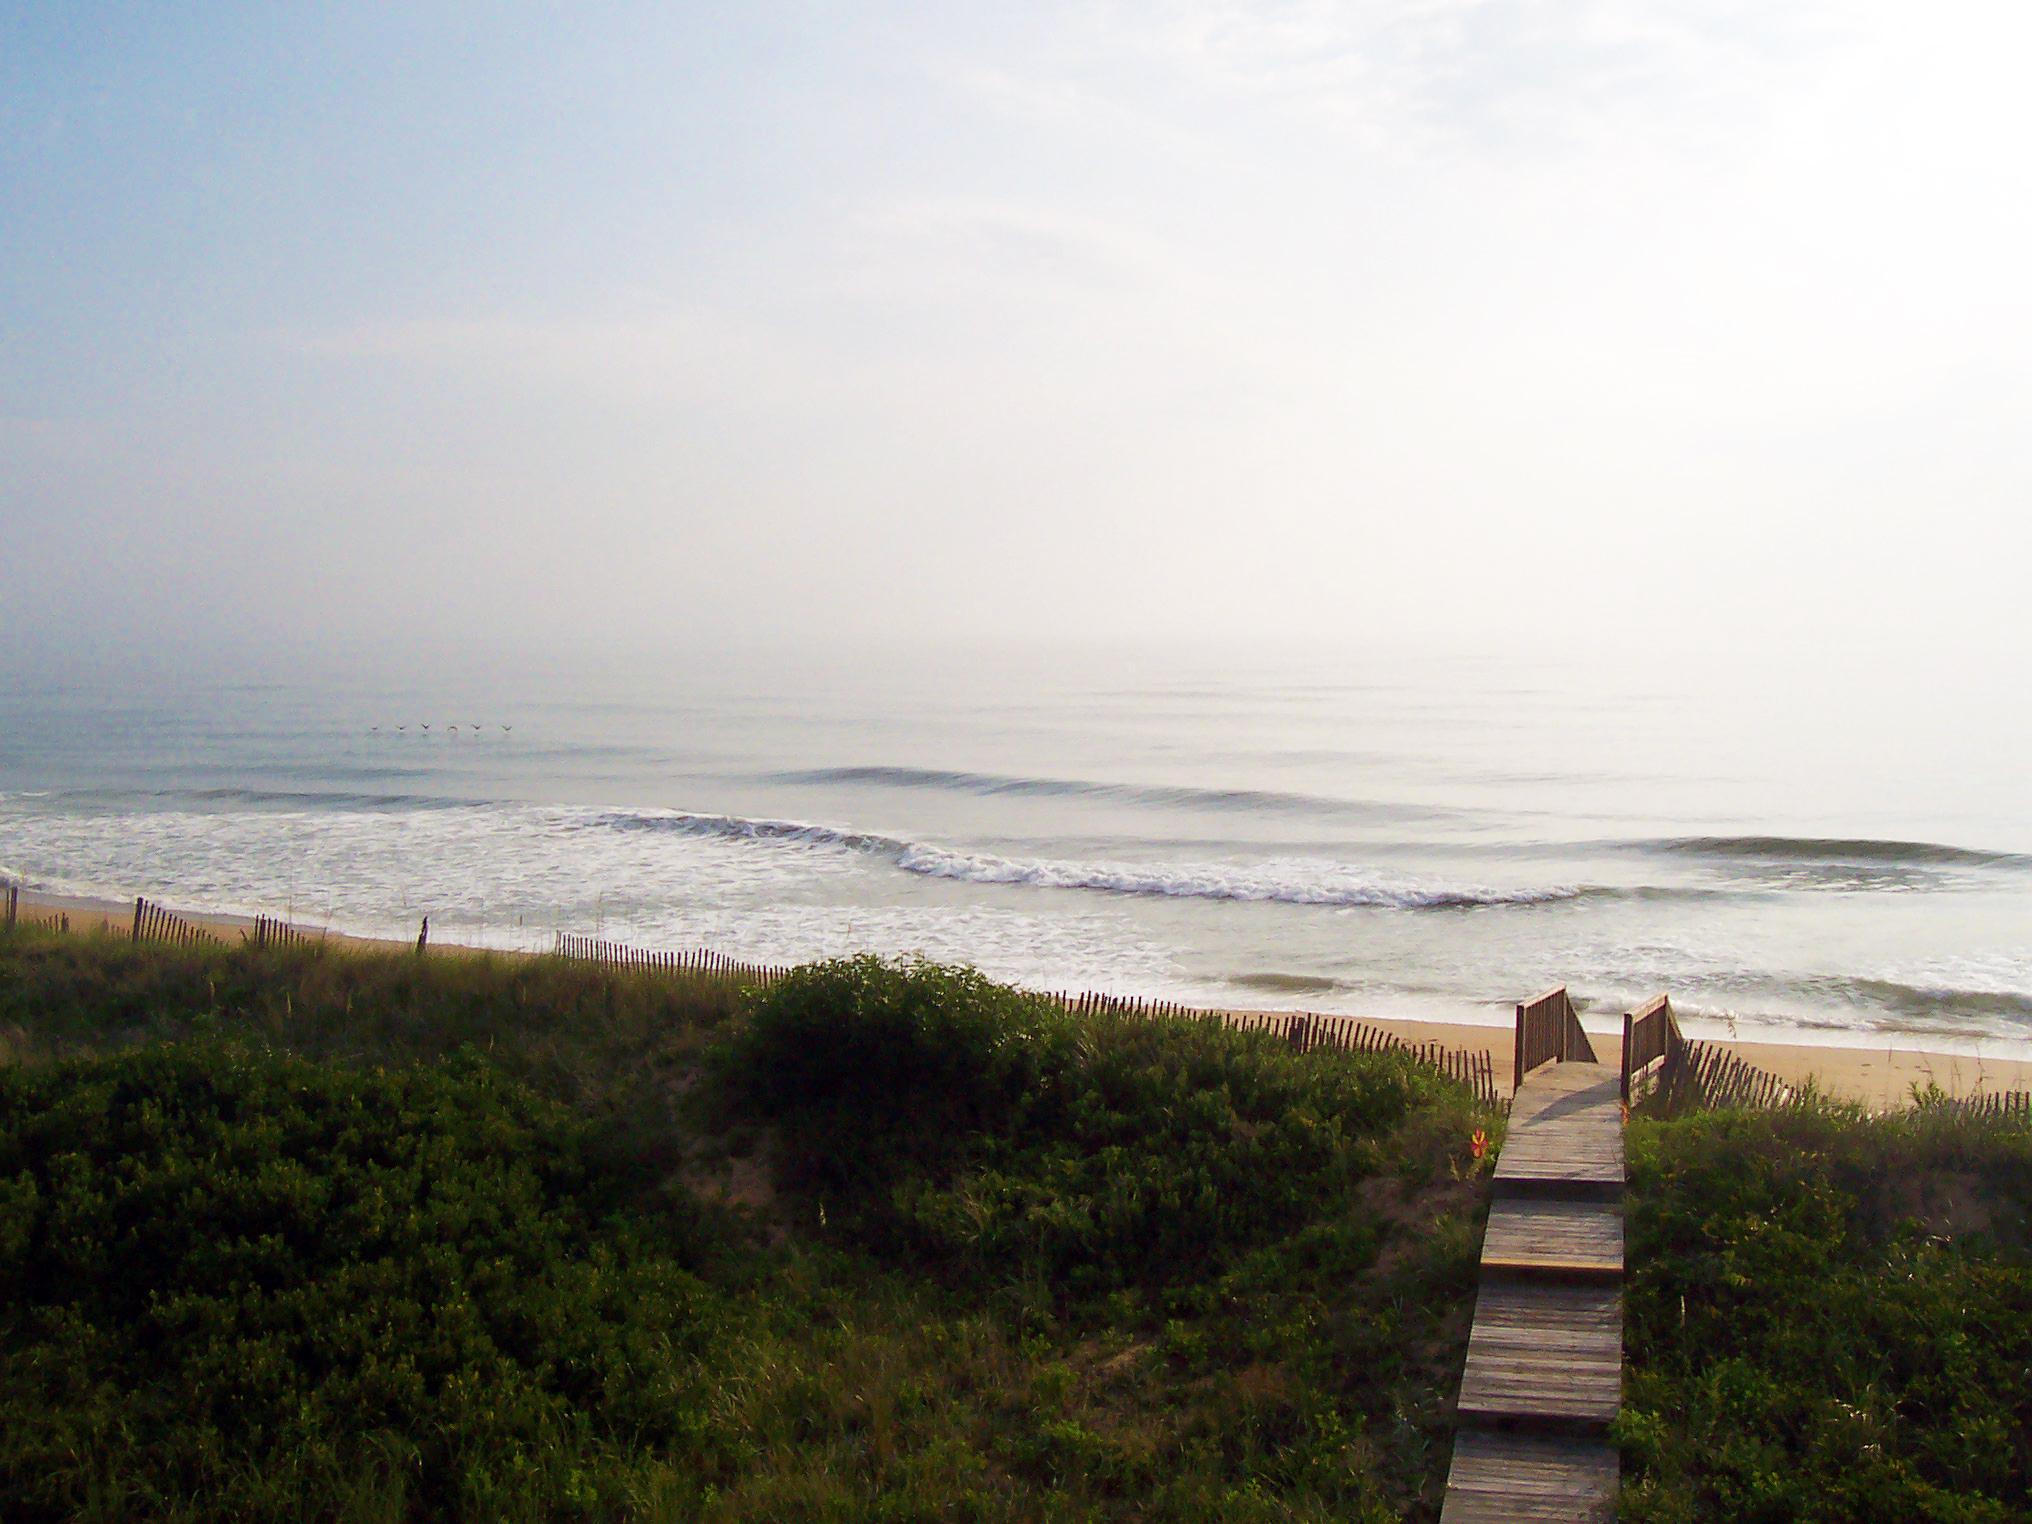 Beach_outer_banks_north_carolina copy